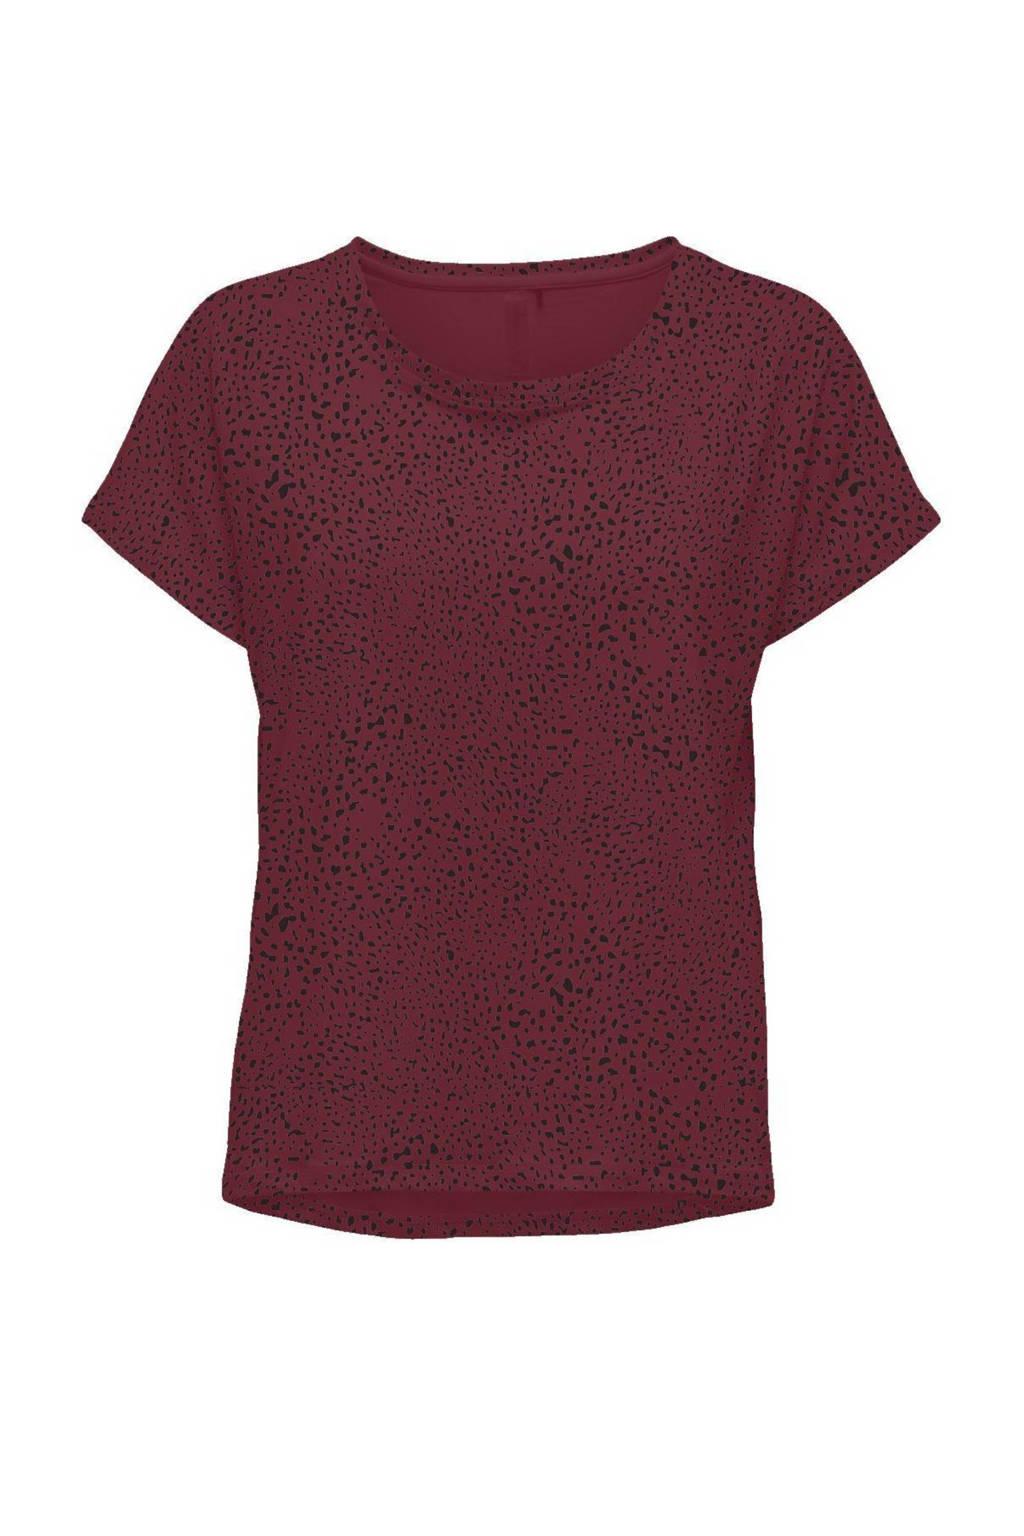 ONLY PLAY Girls sport T-shirt ONPAMARU donkerrood/zwart, Donkerrood/zwart